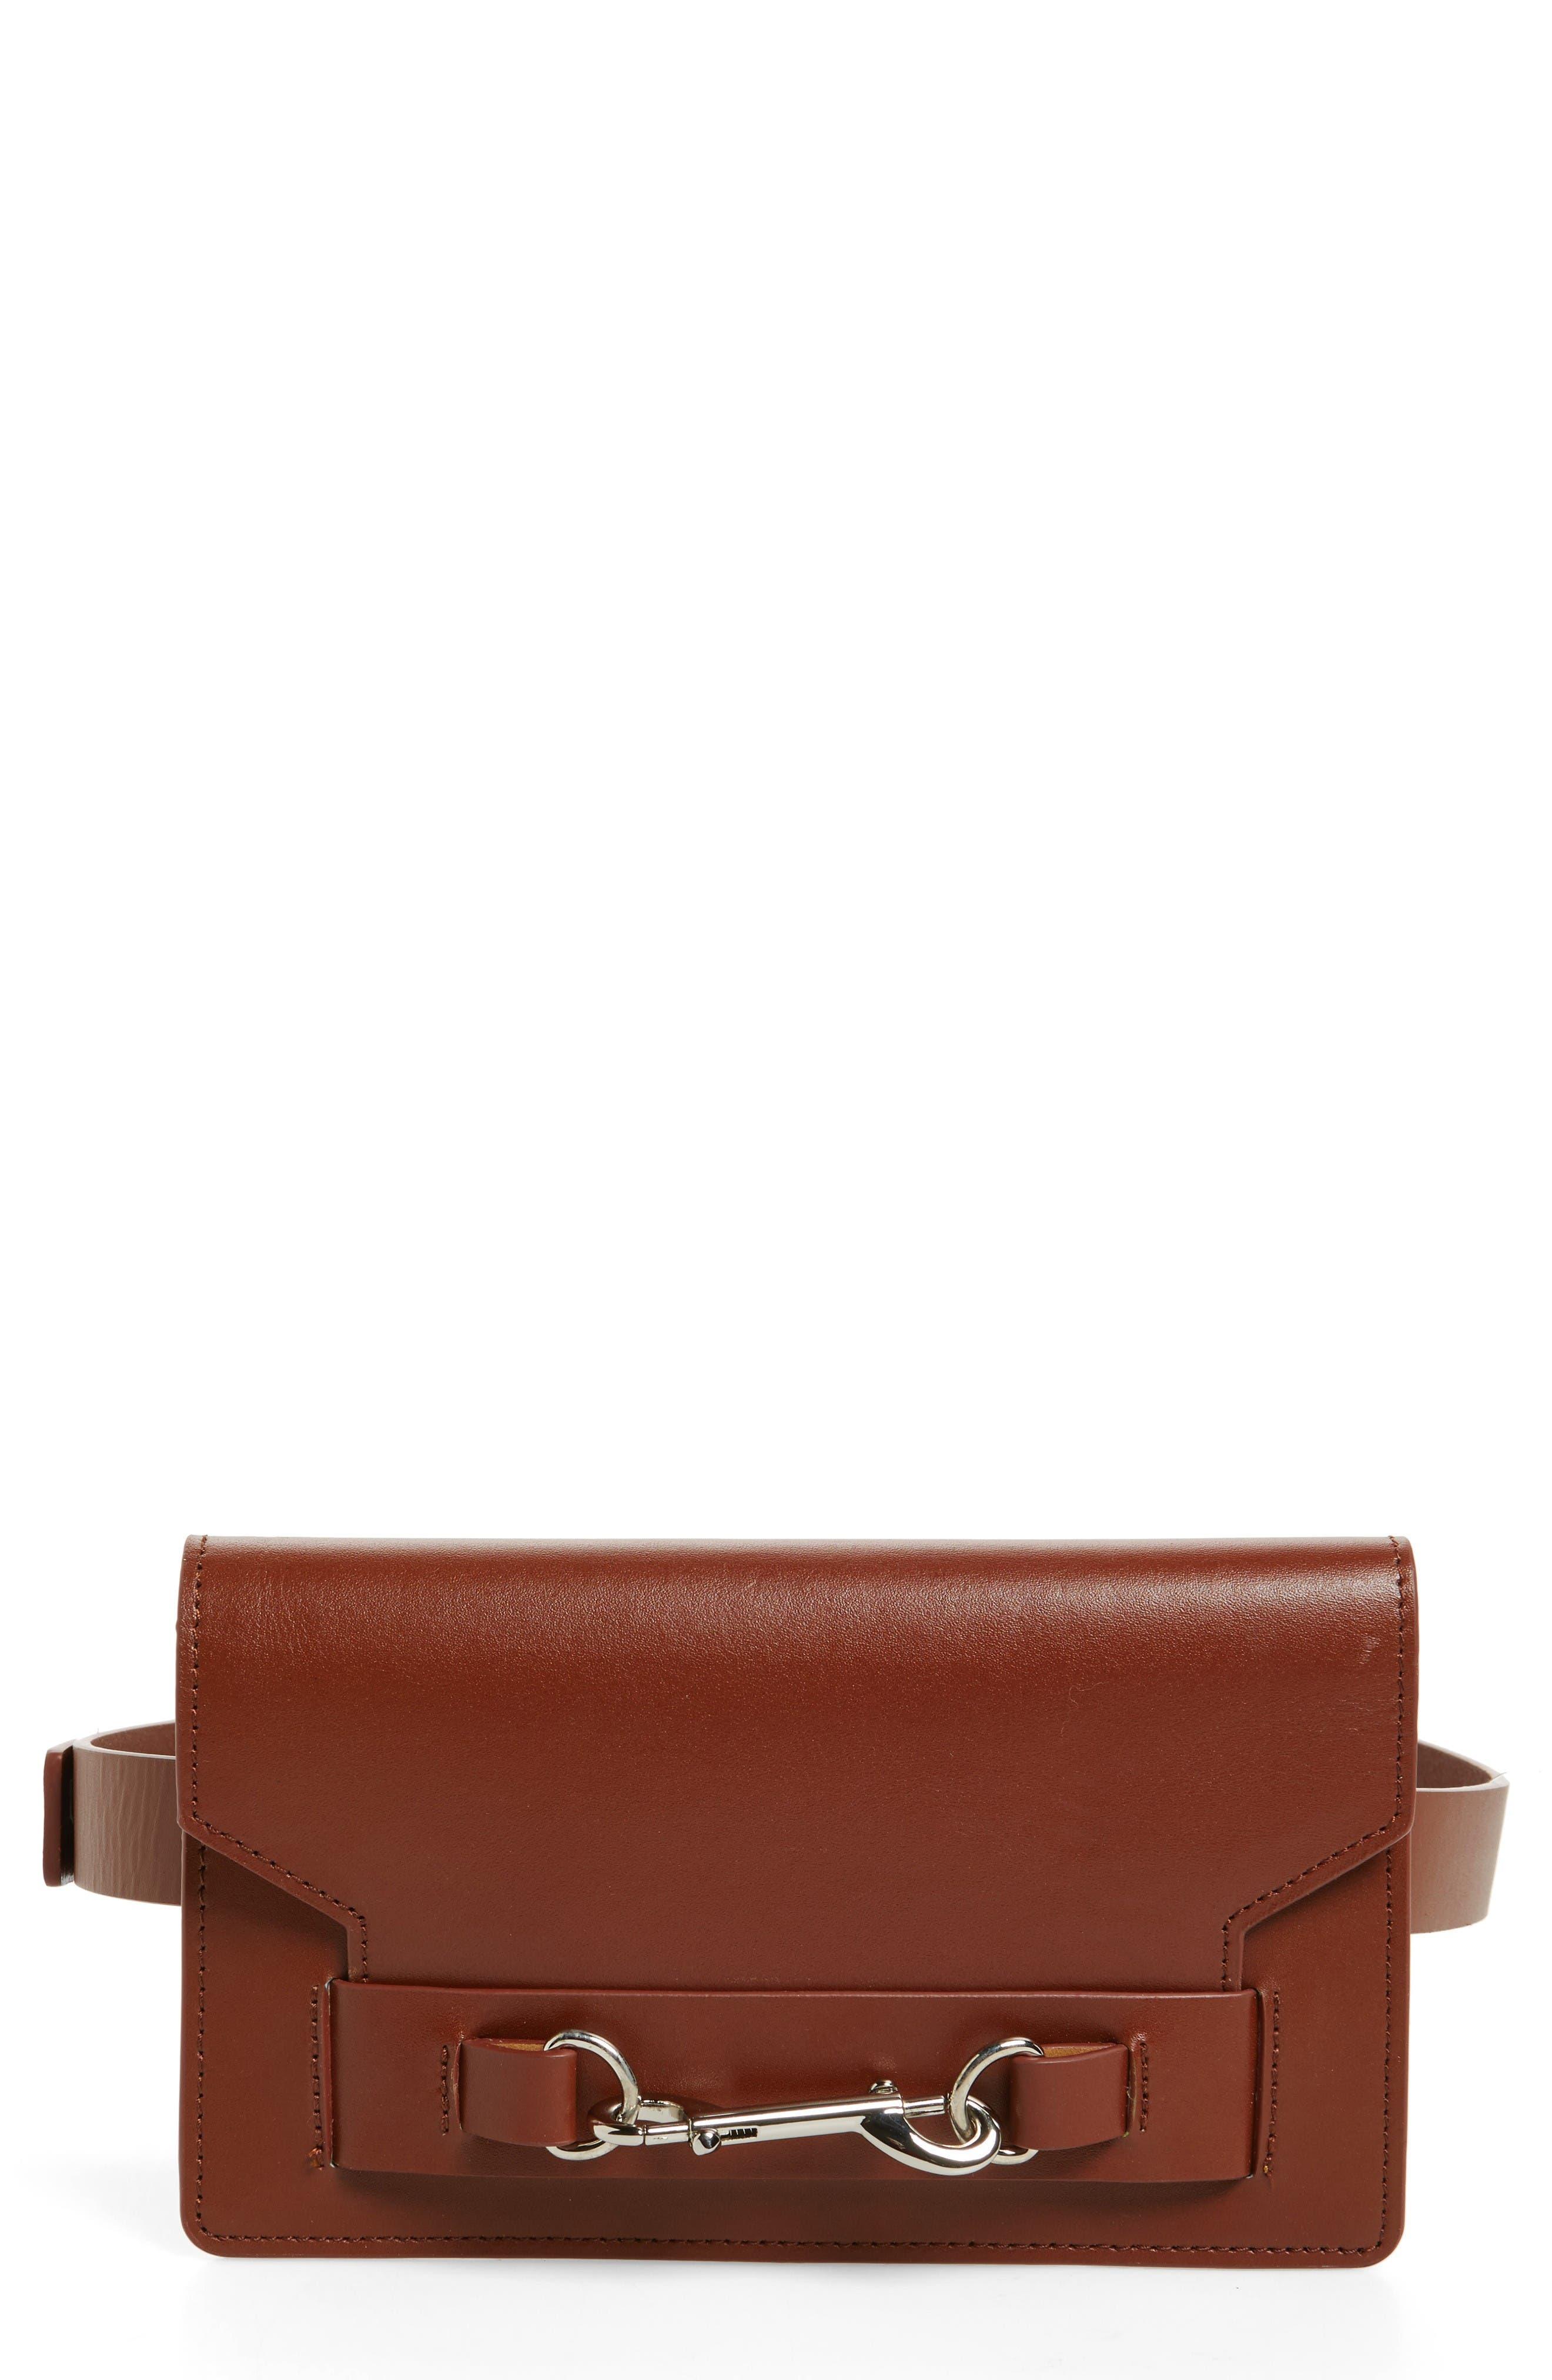 Main Image - Rebecca Minkoff Belt Bag